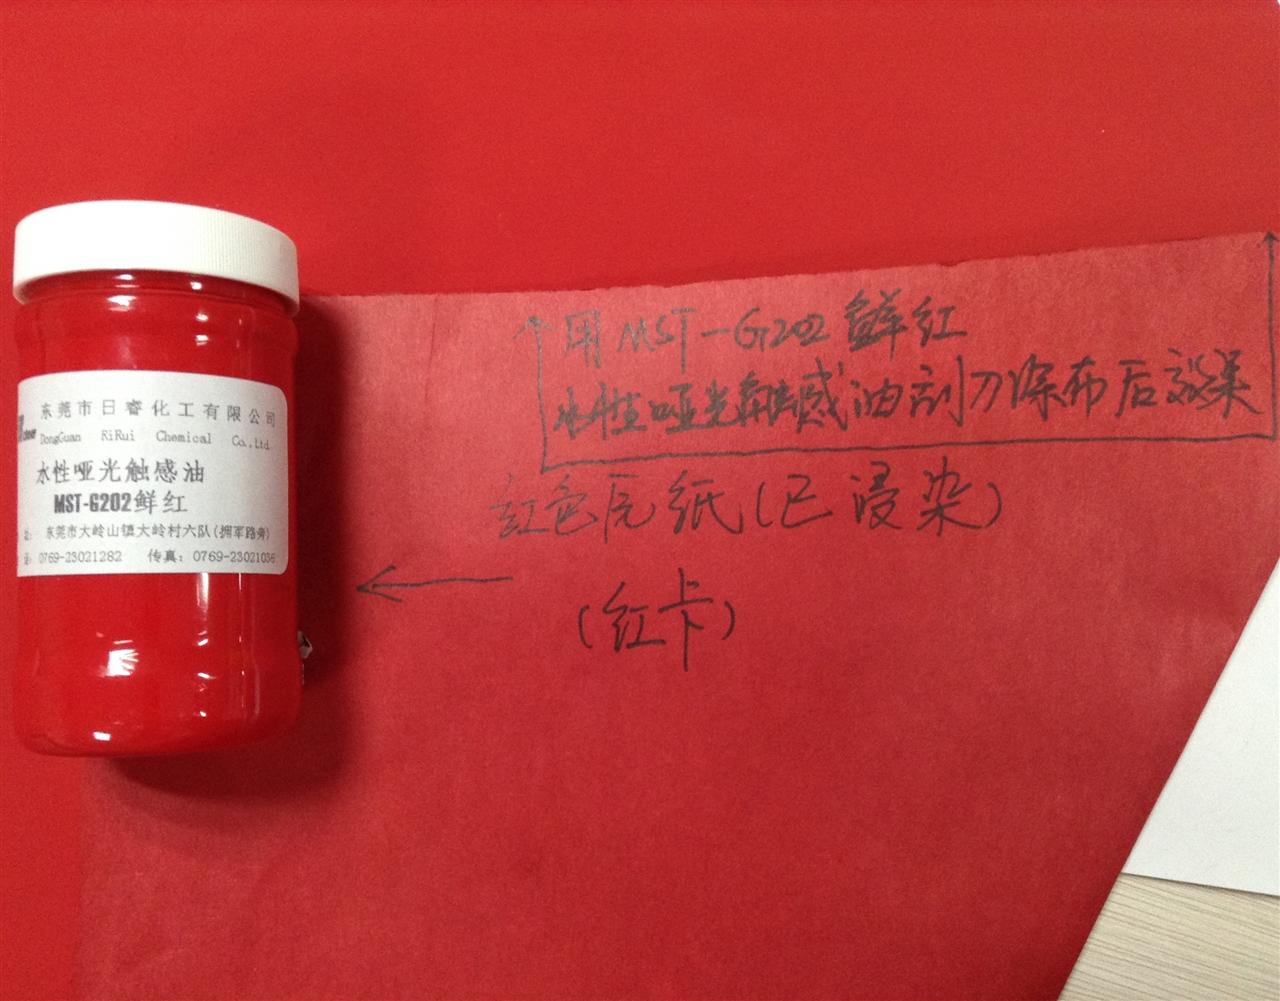 水性哑光触感油 MST-G202 鲜红